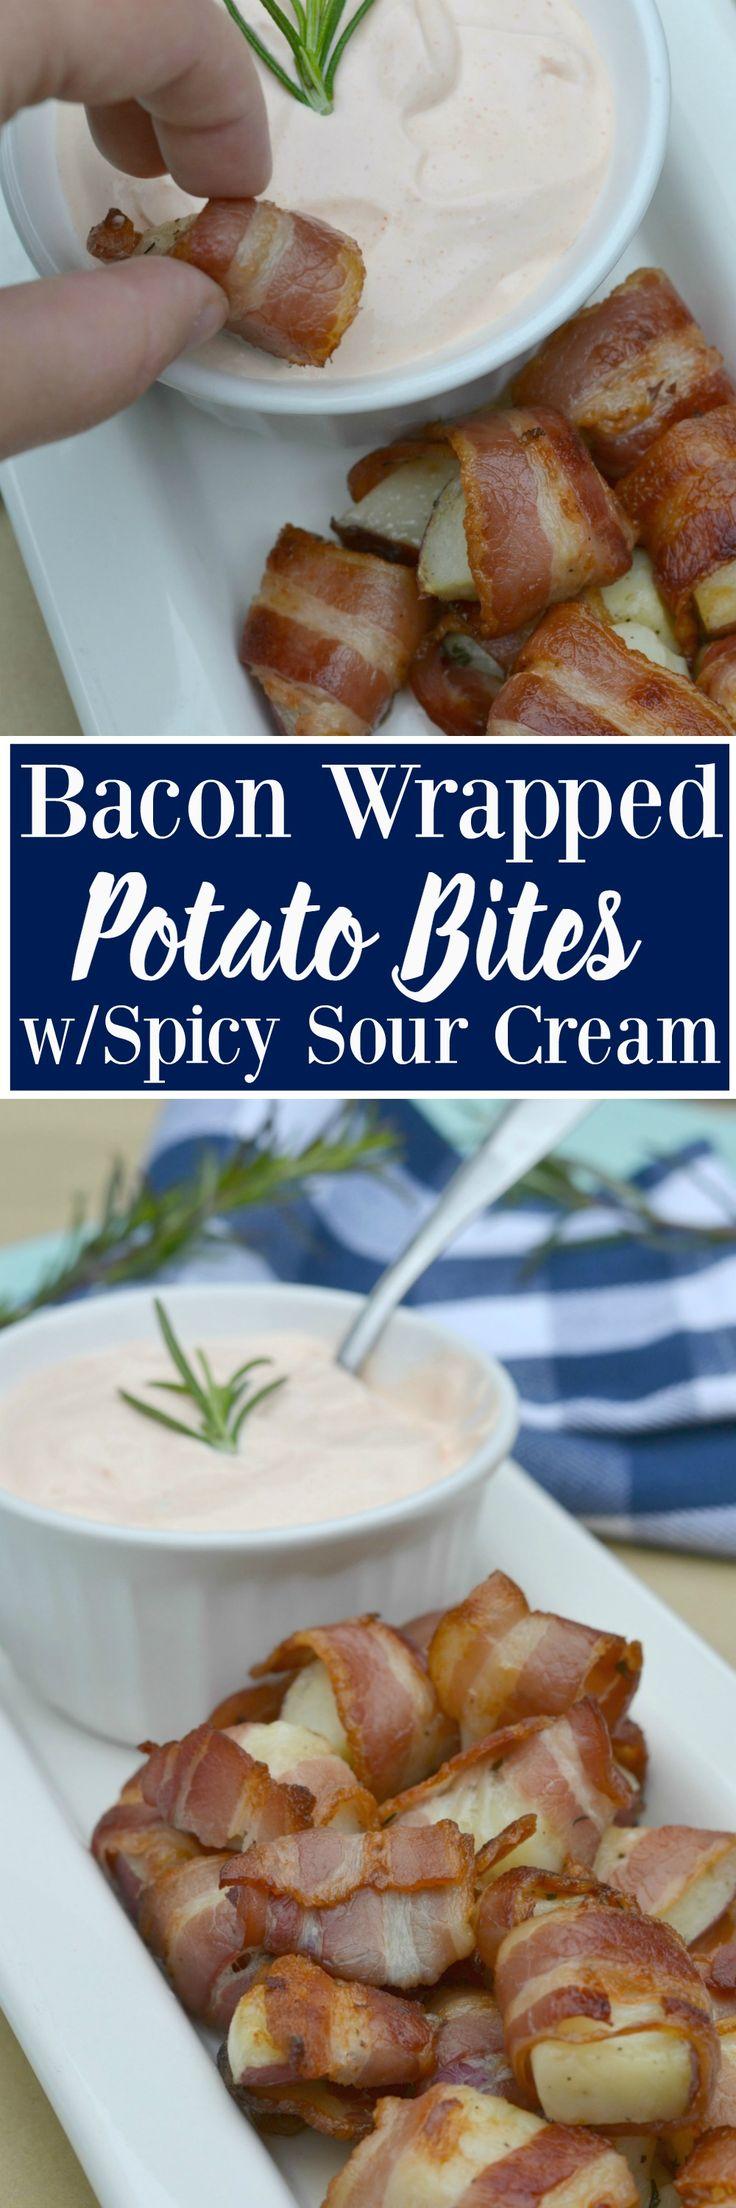 Bacon Wrapped Potato Bites with Spicy Sour Cream Dip